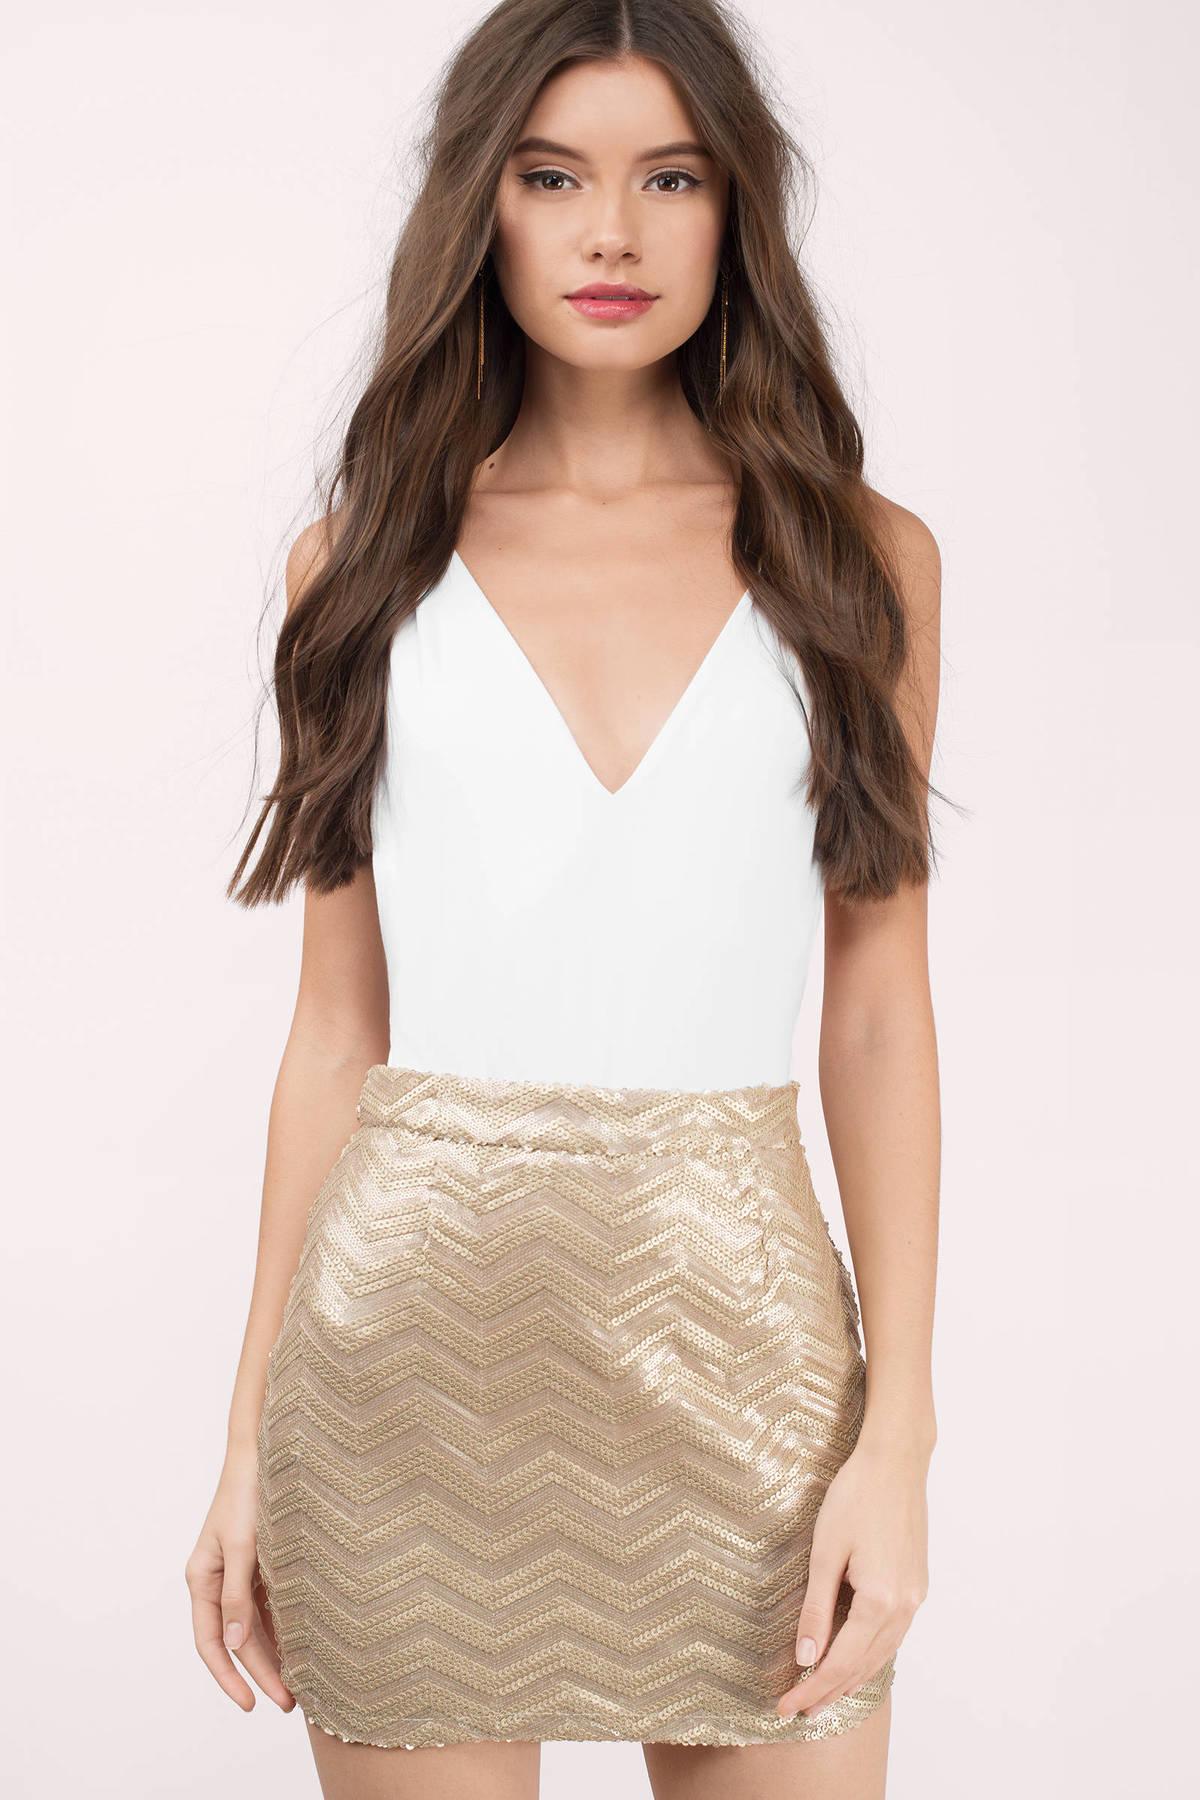 Gold Sequin Skirts | Shop Gold Sequin Skirts at Tobi